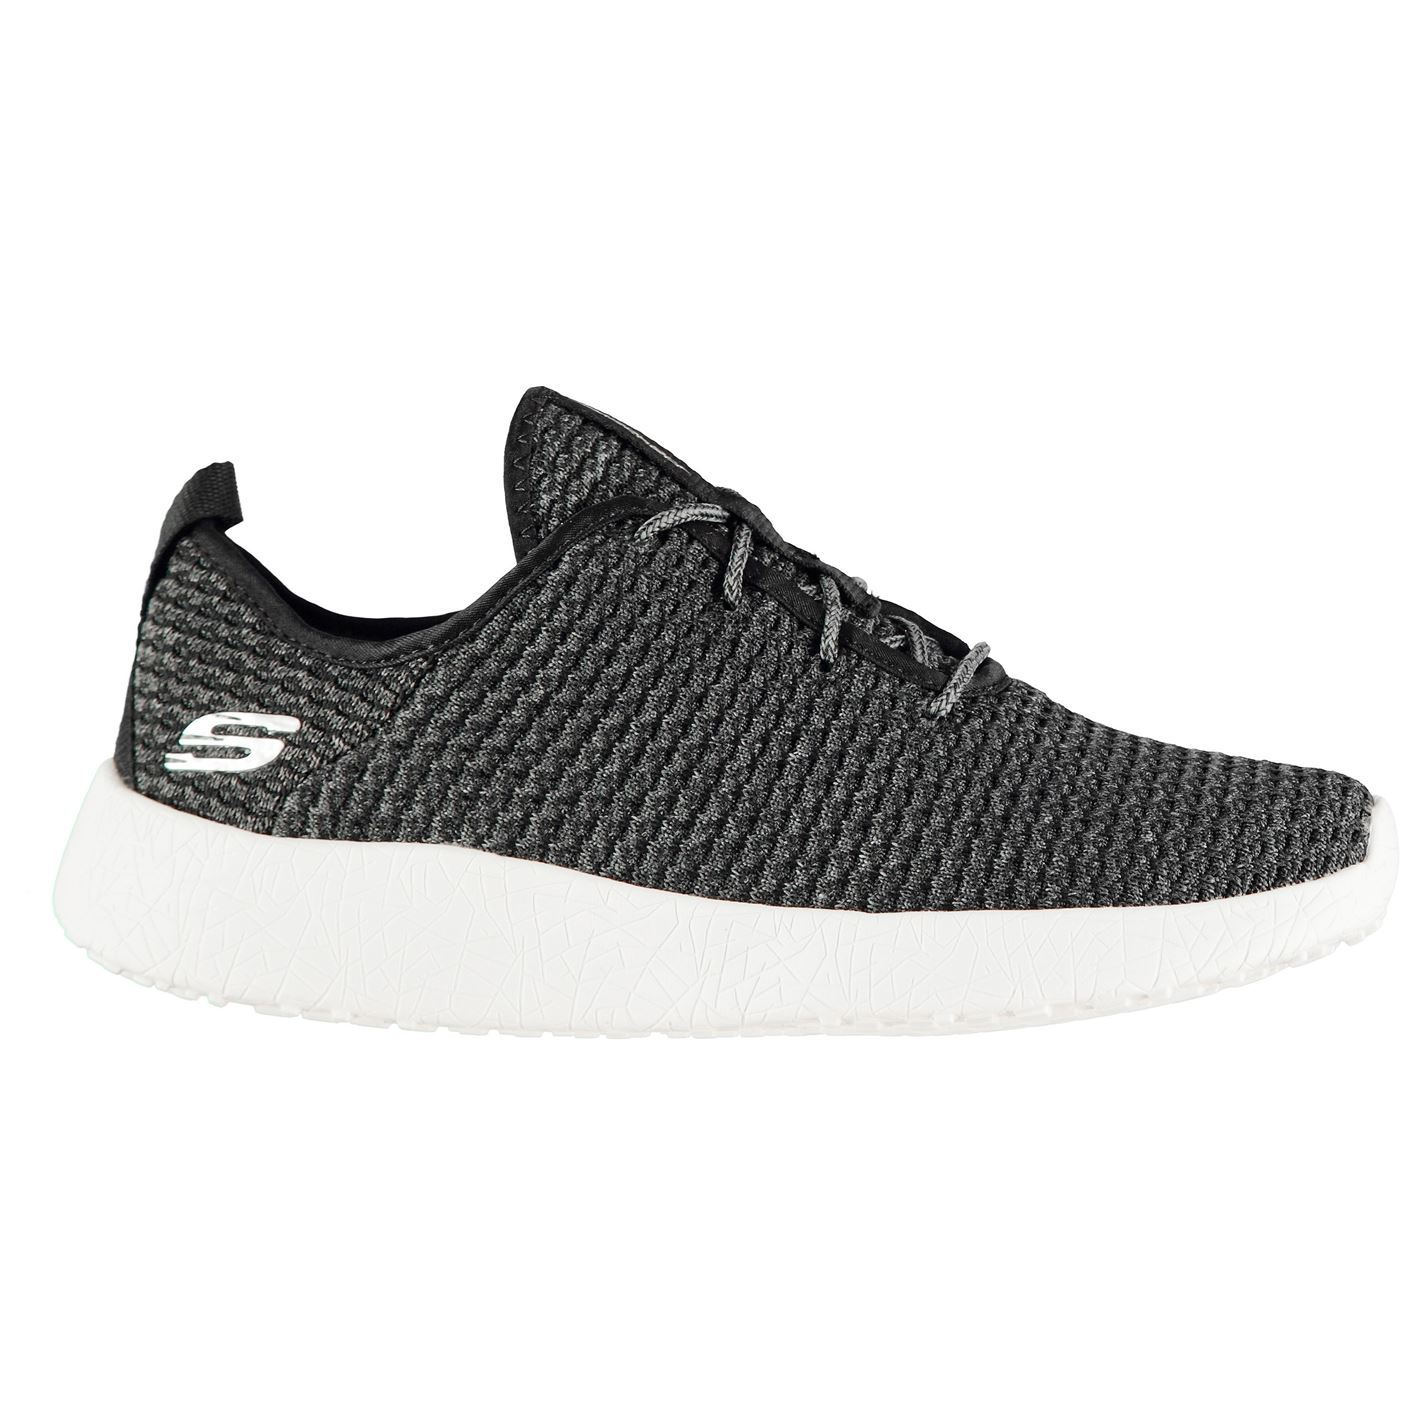 Sneakers scene 1